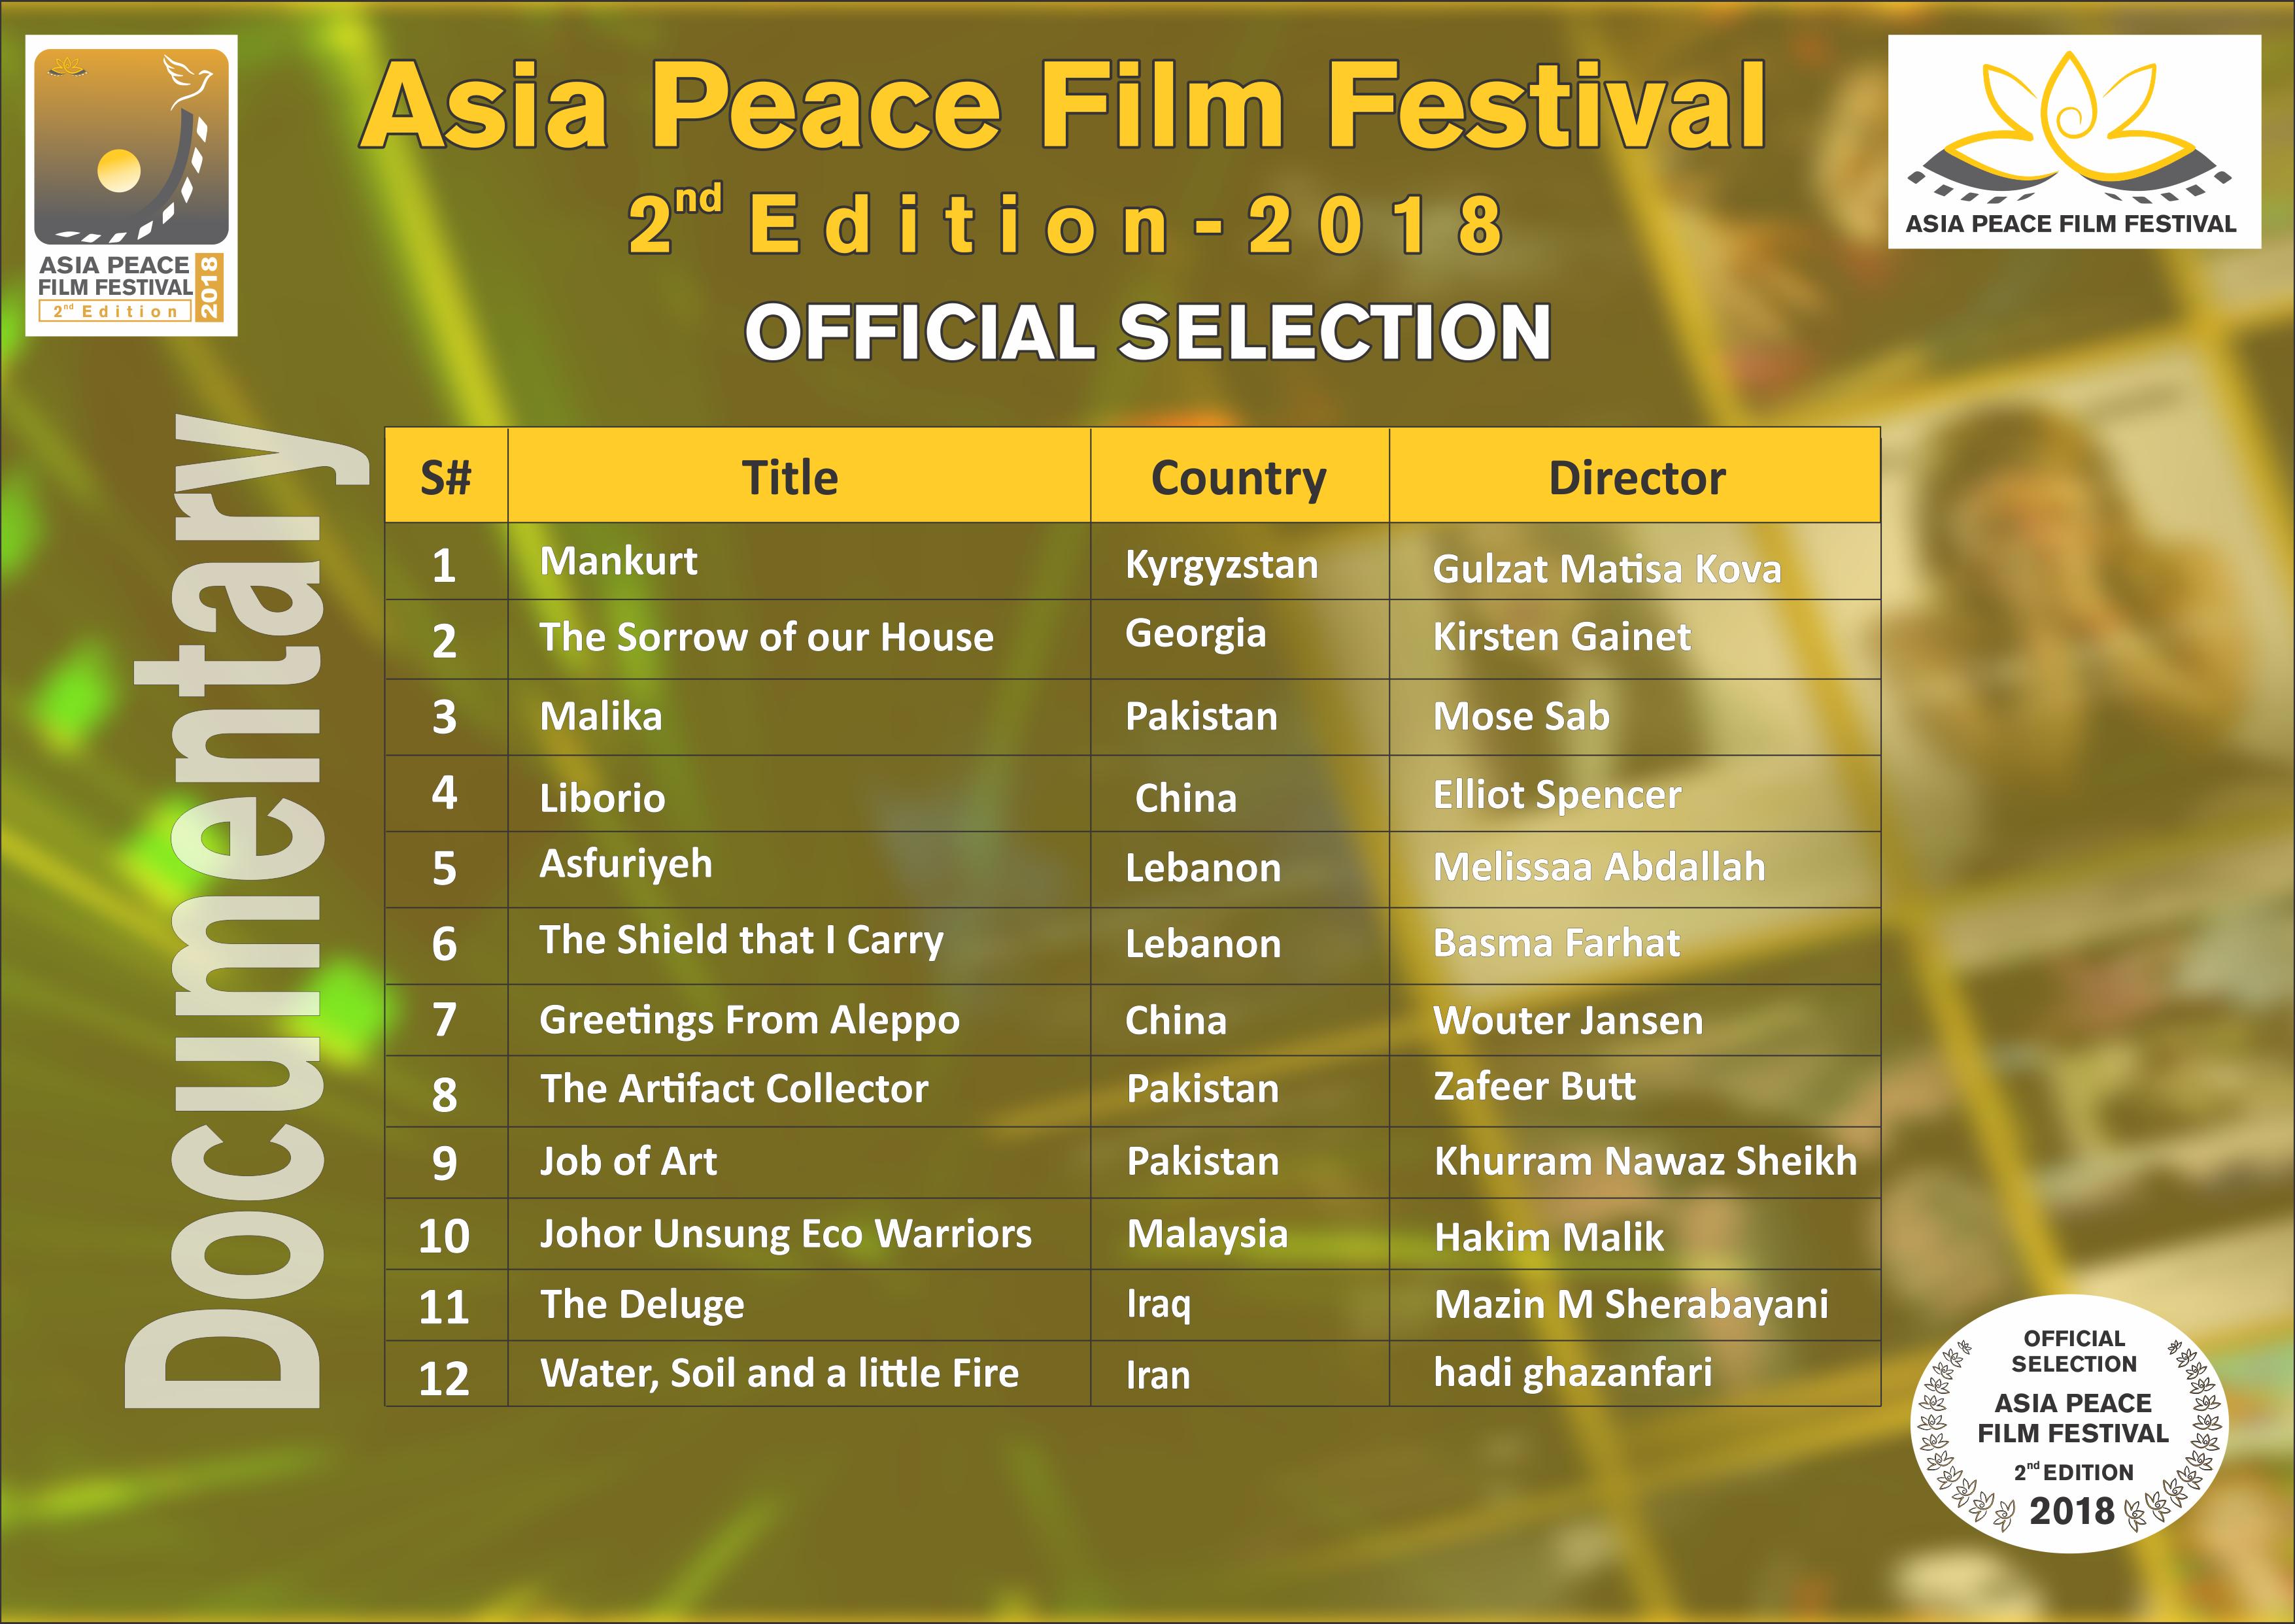 Asia Peace Film Festival - Celebrating Diversity, Harnessing